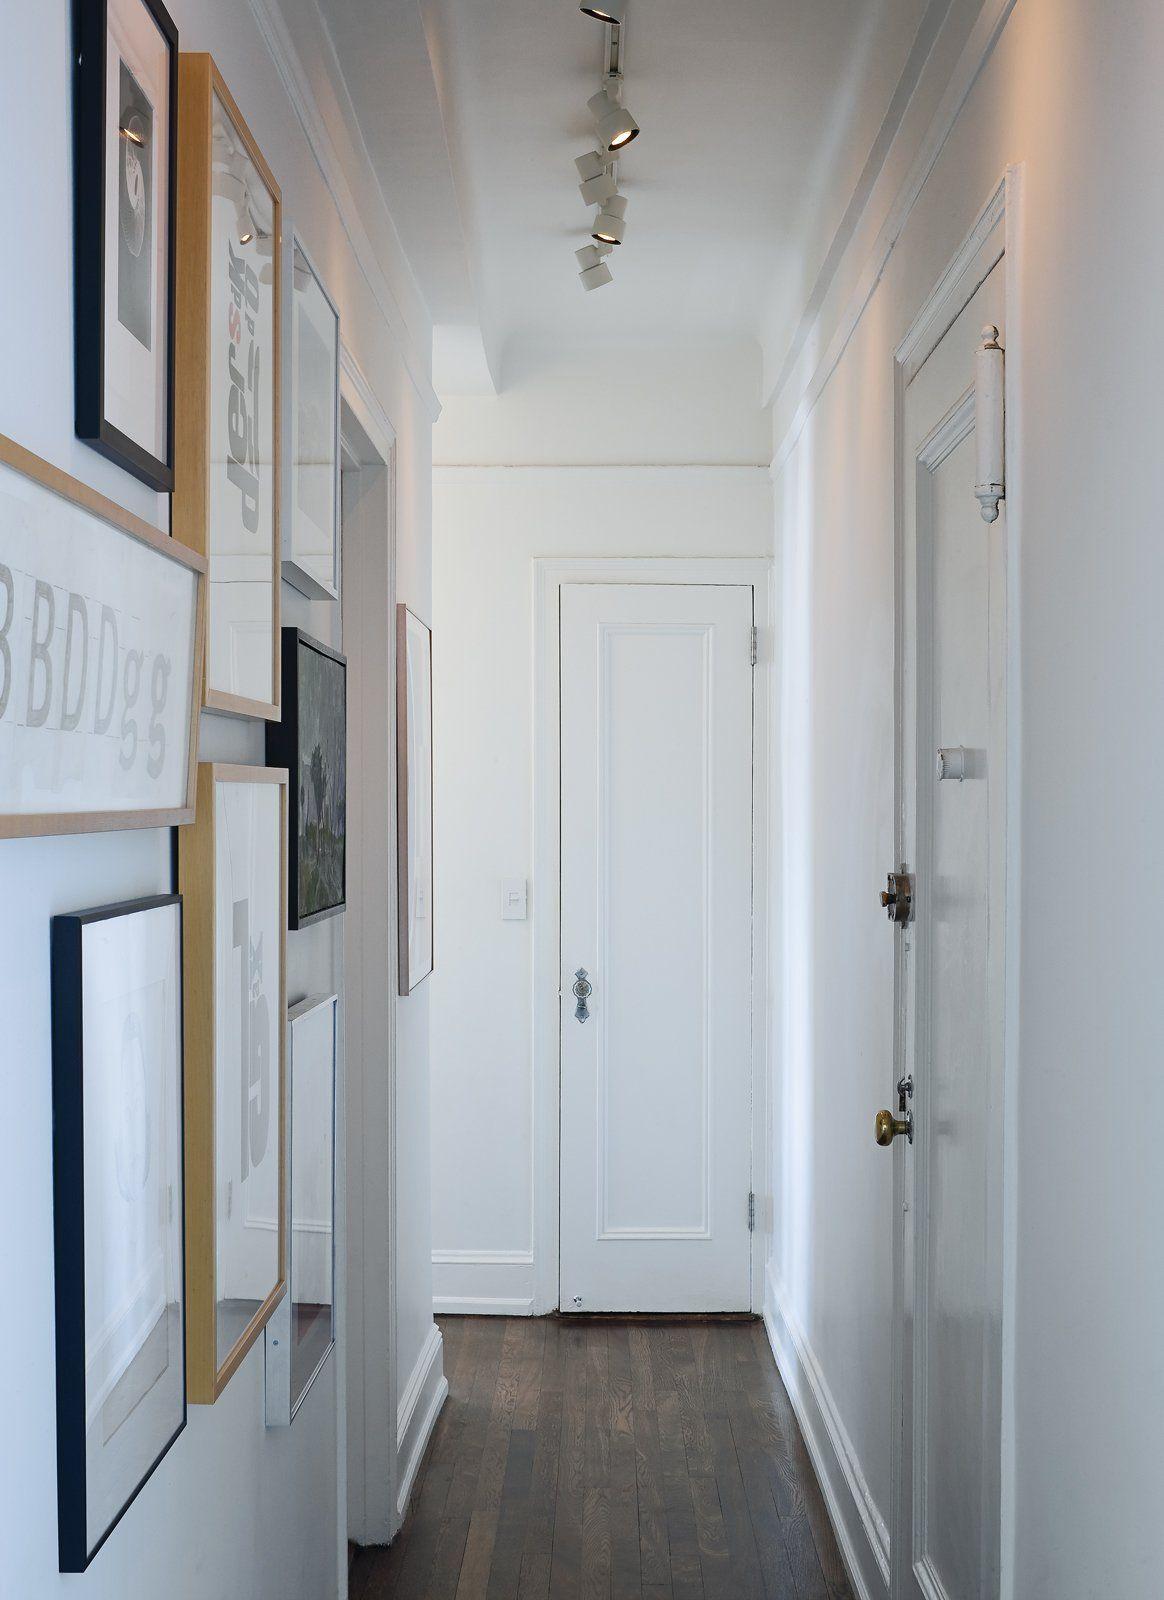 Narrow hallway decor  A narrow hallway typical of prewar apartments doubles as an art